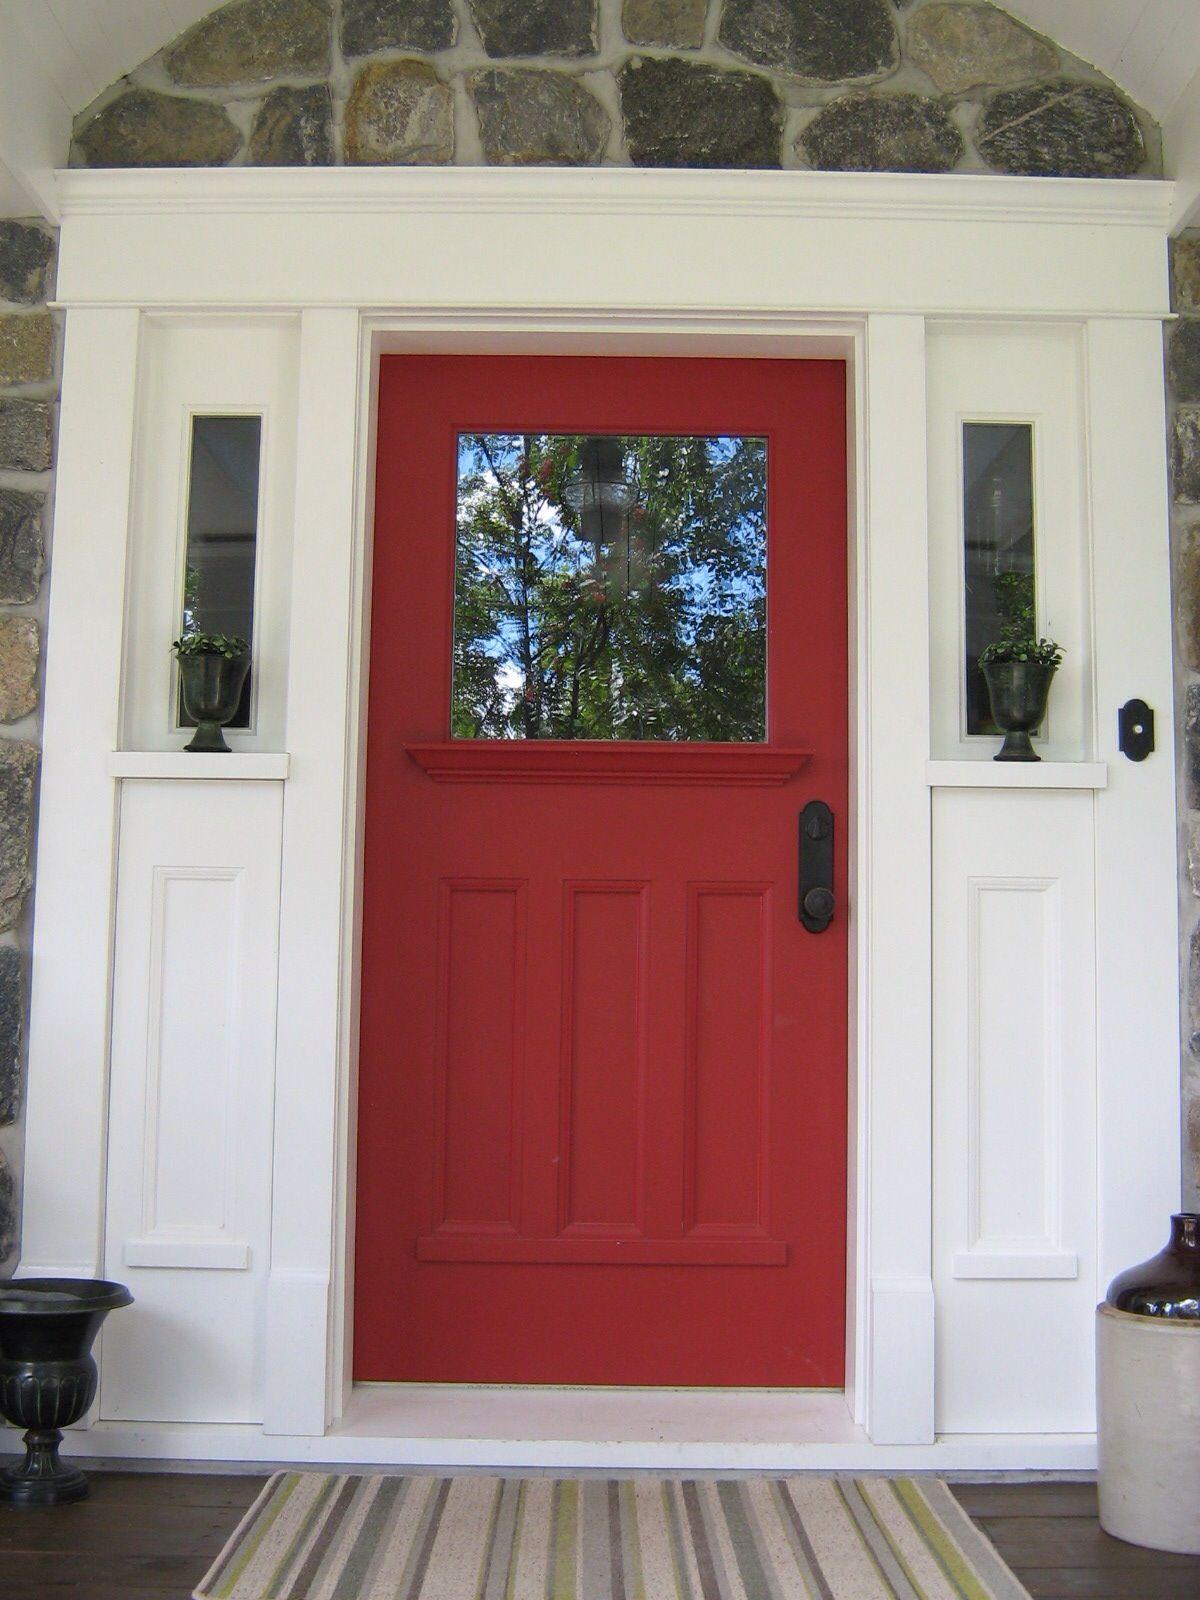 Porte d 39 entr e en bois menuiserie delisle entr e for Menuiserie porte entree